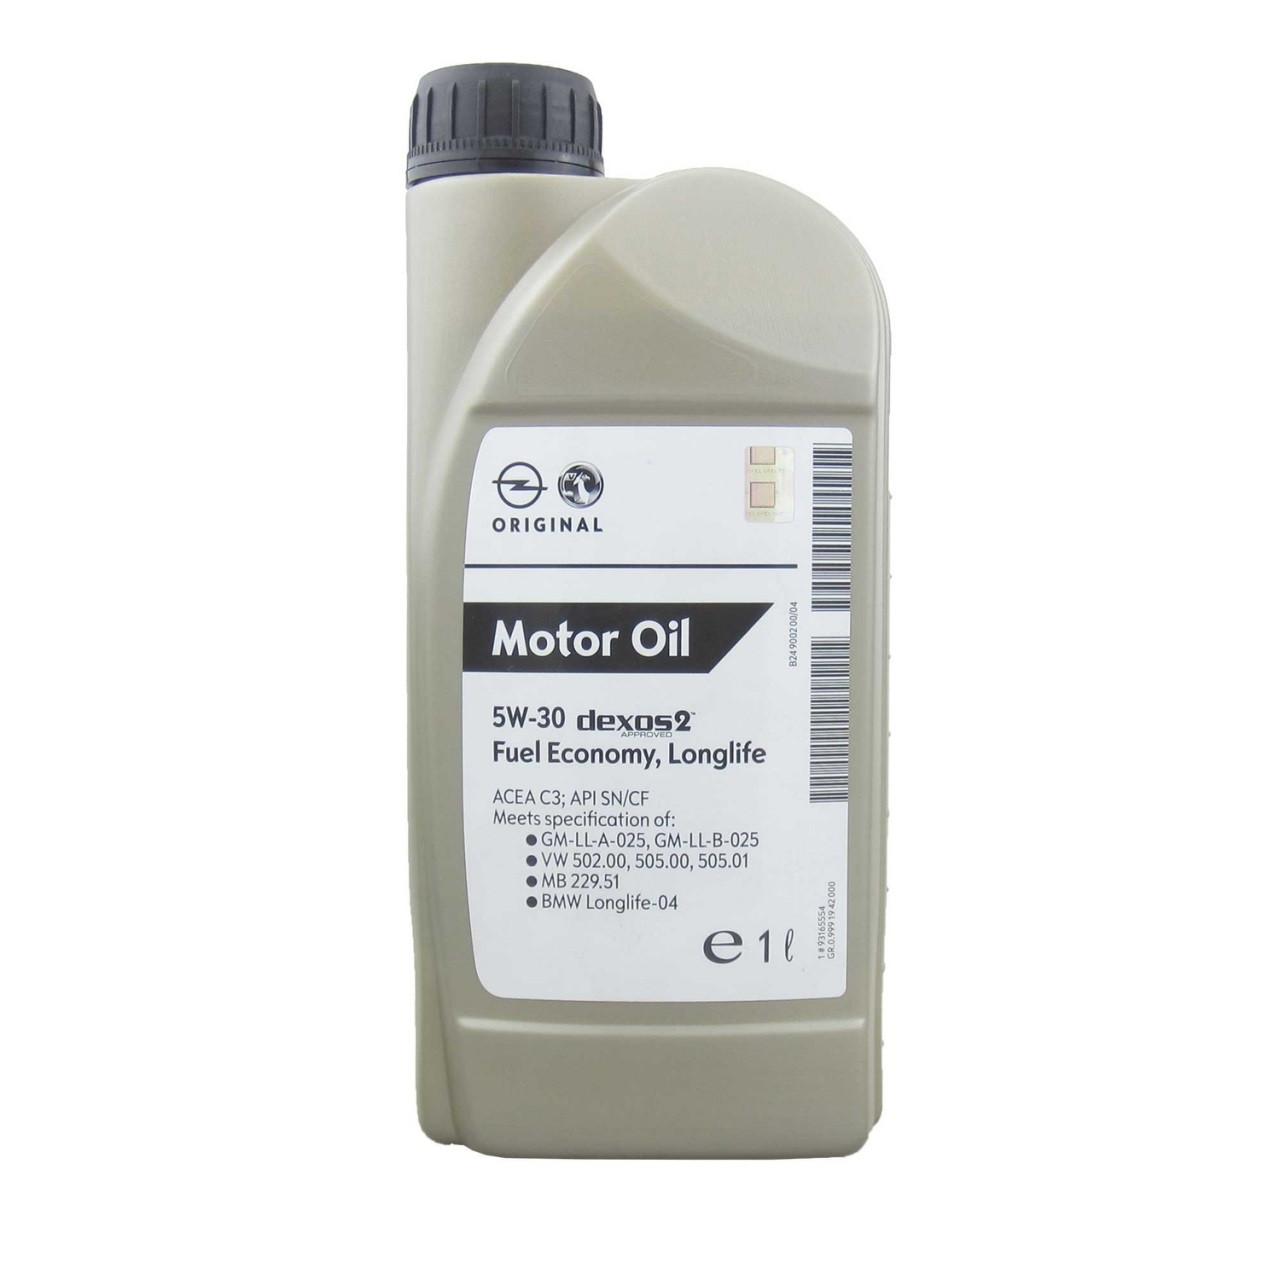 Моторное масло GM General Motors Dexos2 5W-30 1 л (1942000)